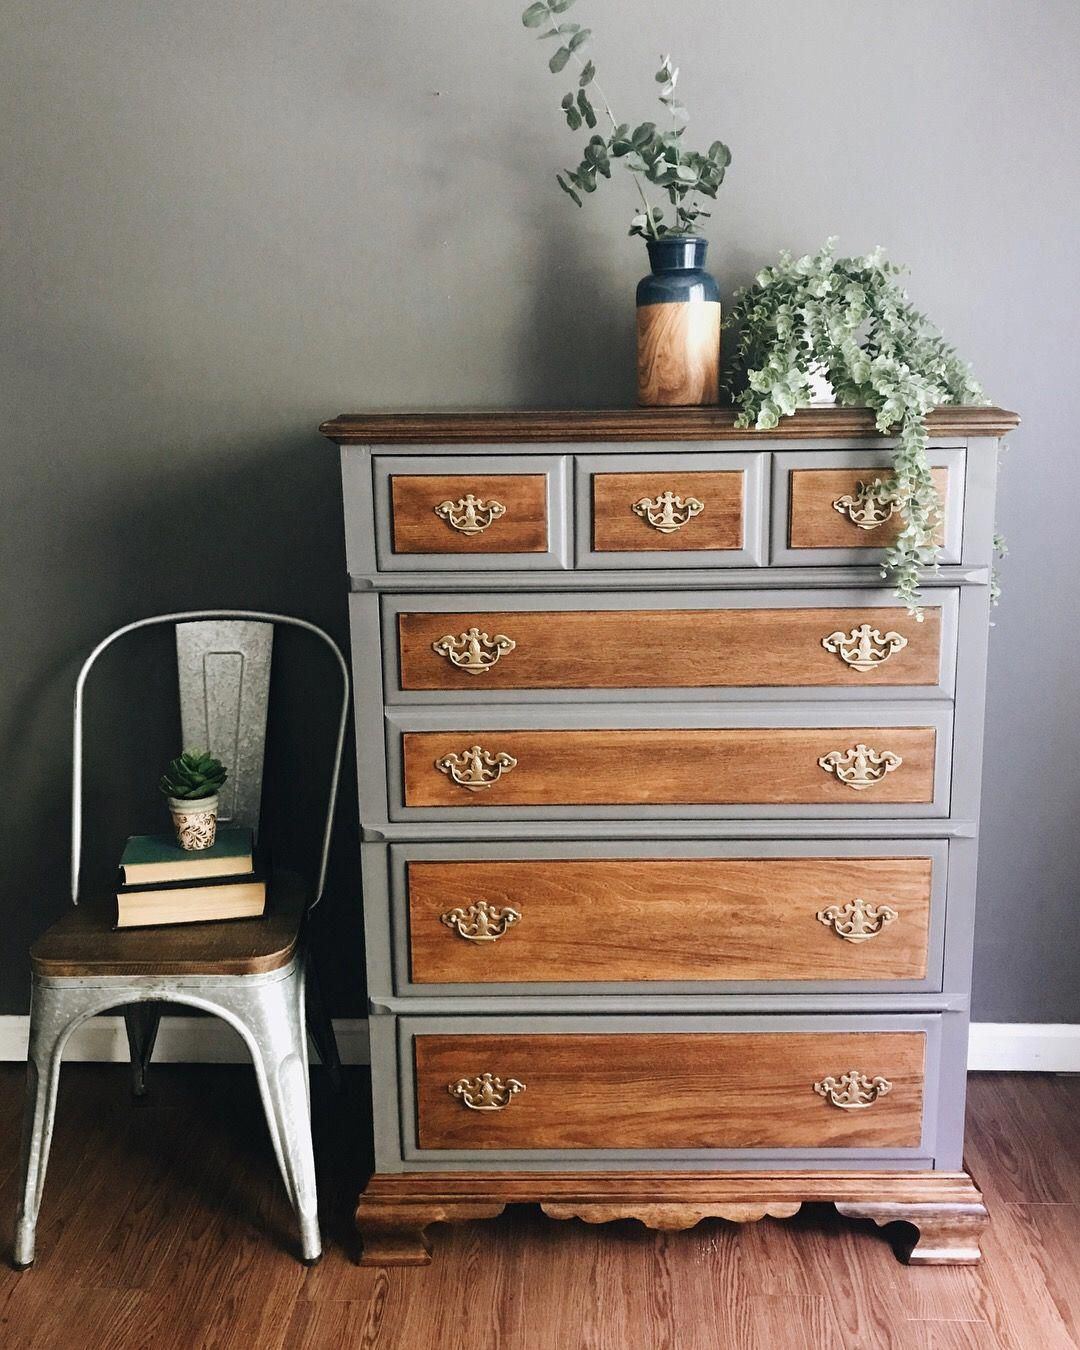 Antique Looking Furniture Old Wooden Sofa For Sale Vintage Furniture For Sale Cheap 20190701 Upcycle Wood Furniture Restoration Furniture Decor